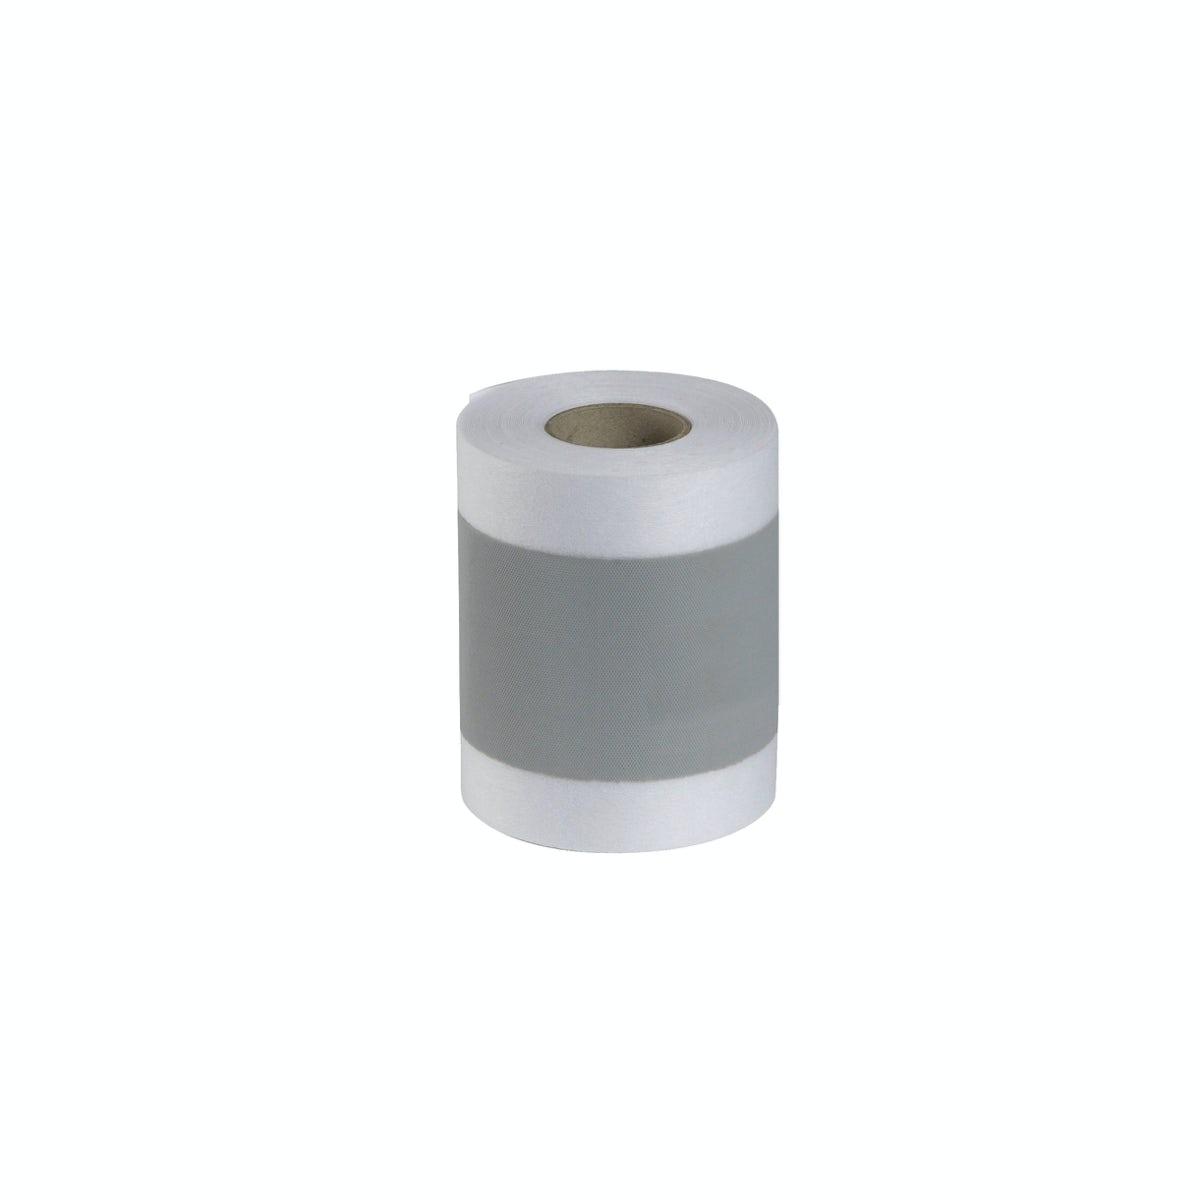 Waterproof Tape 5mm